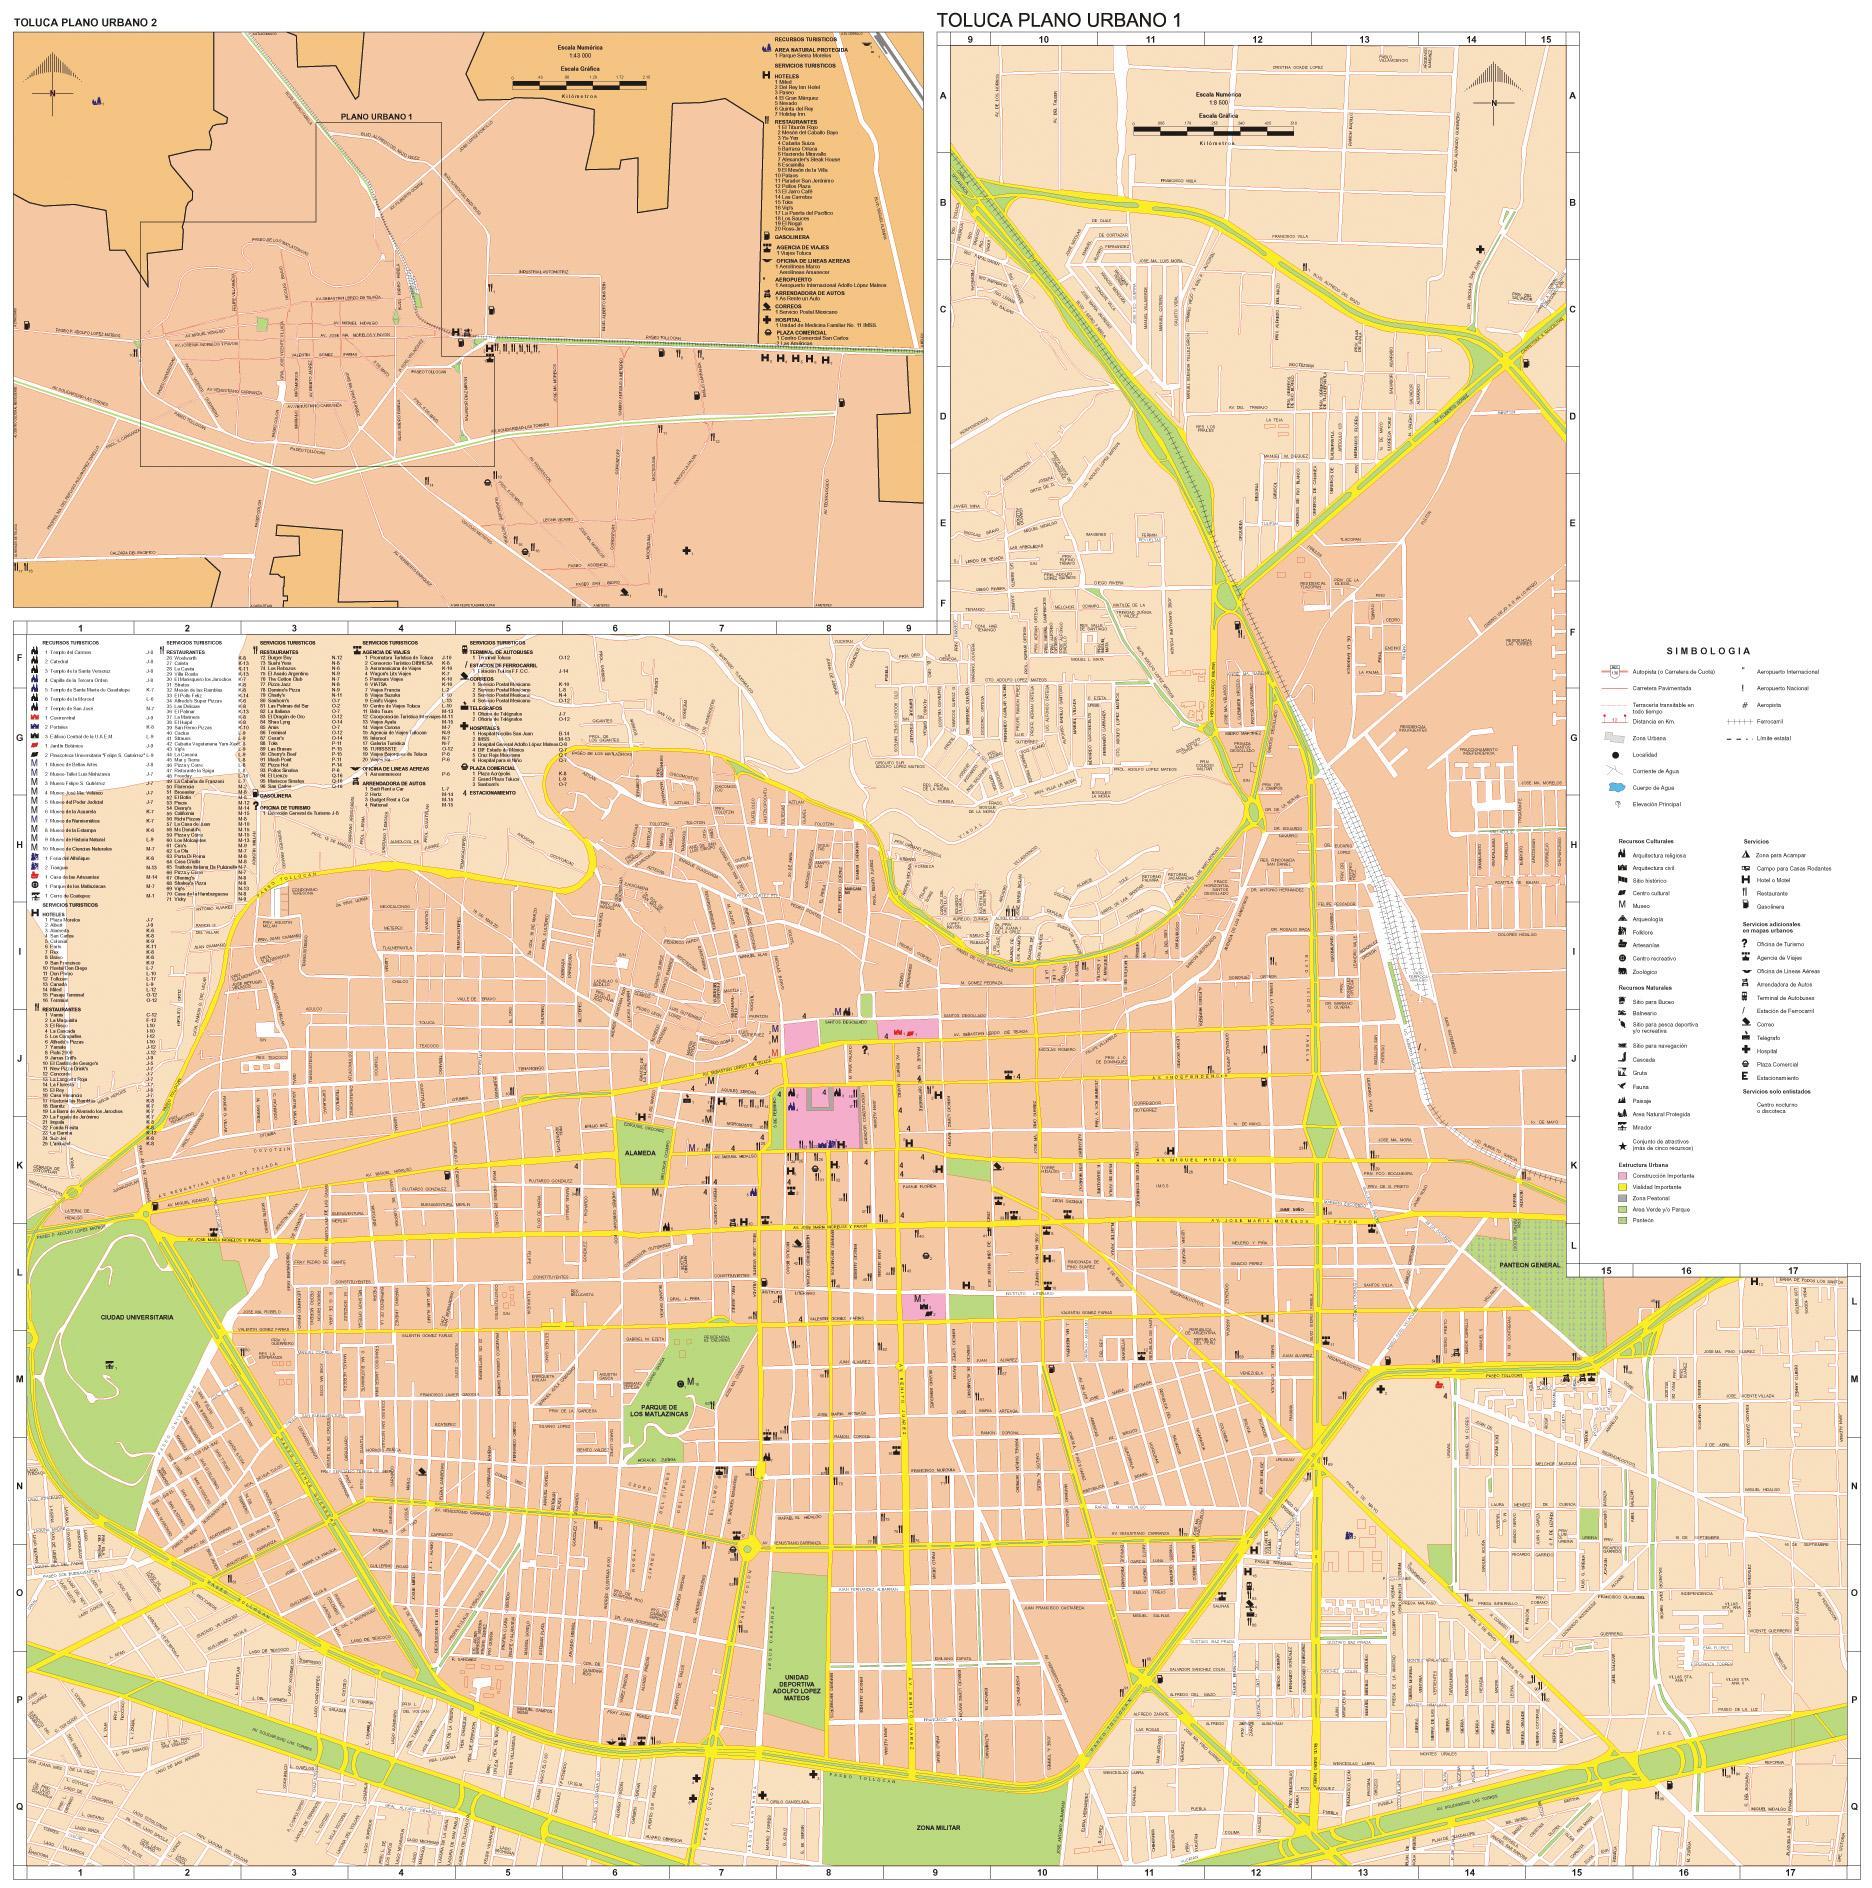 Mapa Toluca, Edo Mexico